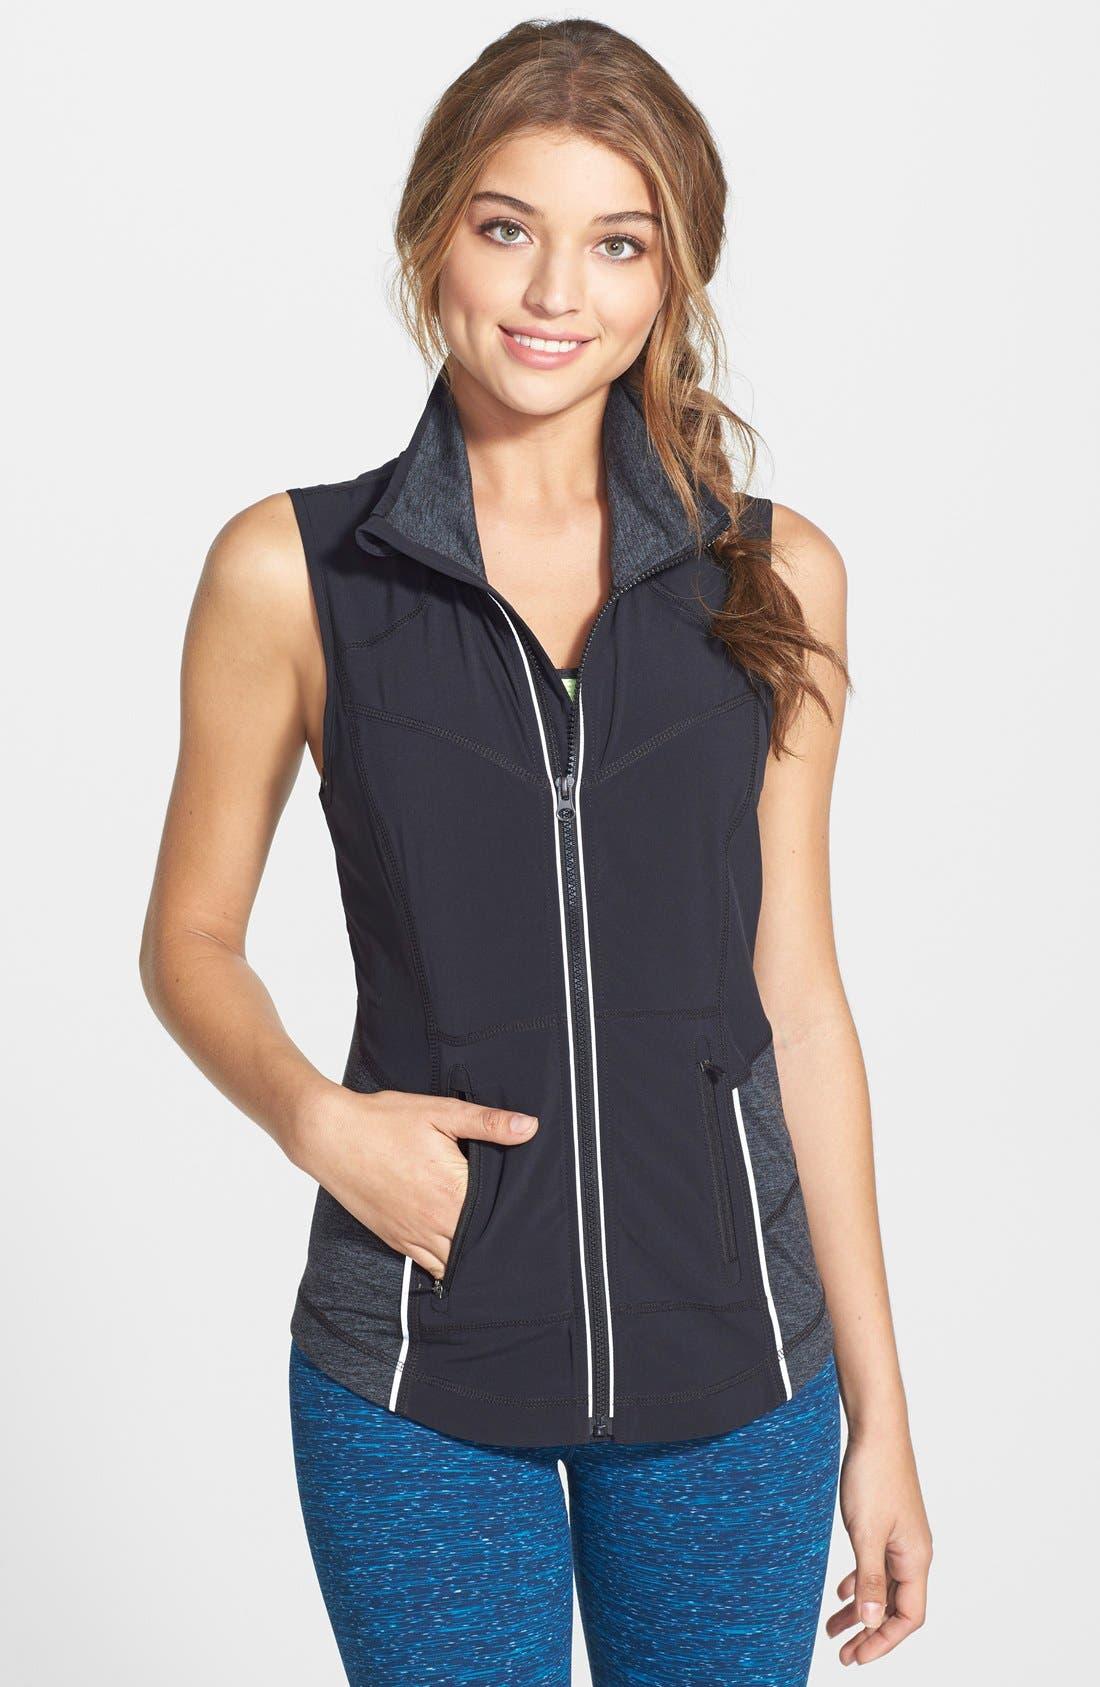 Main Image - Zella 'Momentum' Vest